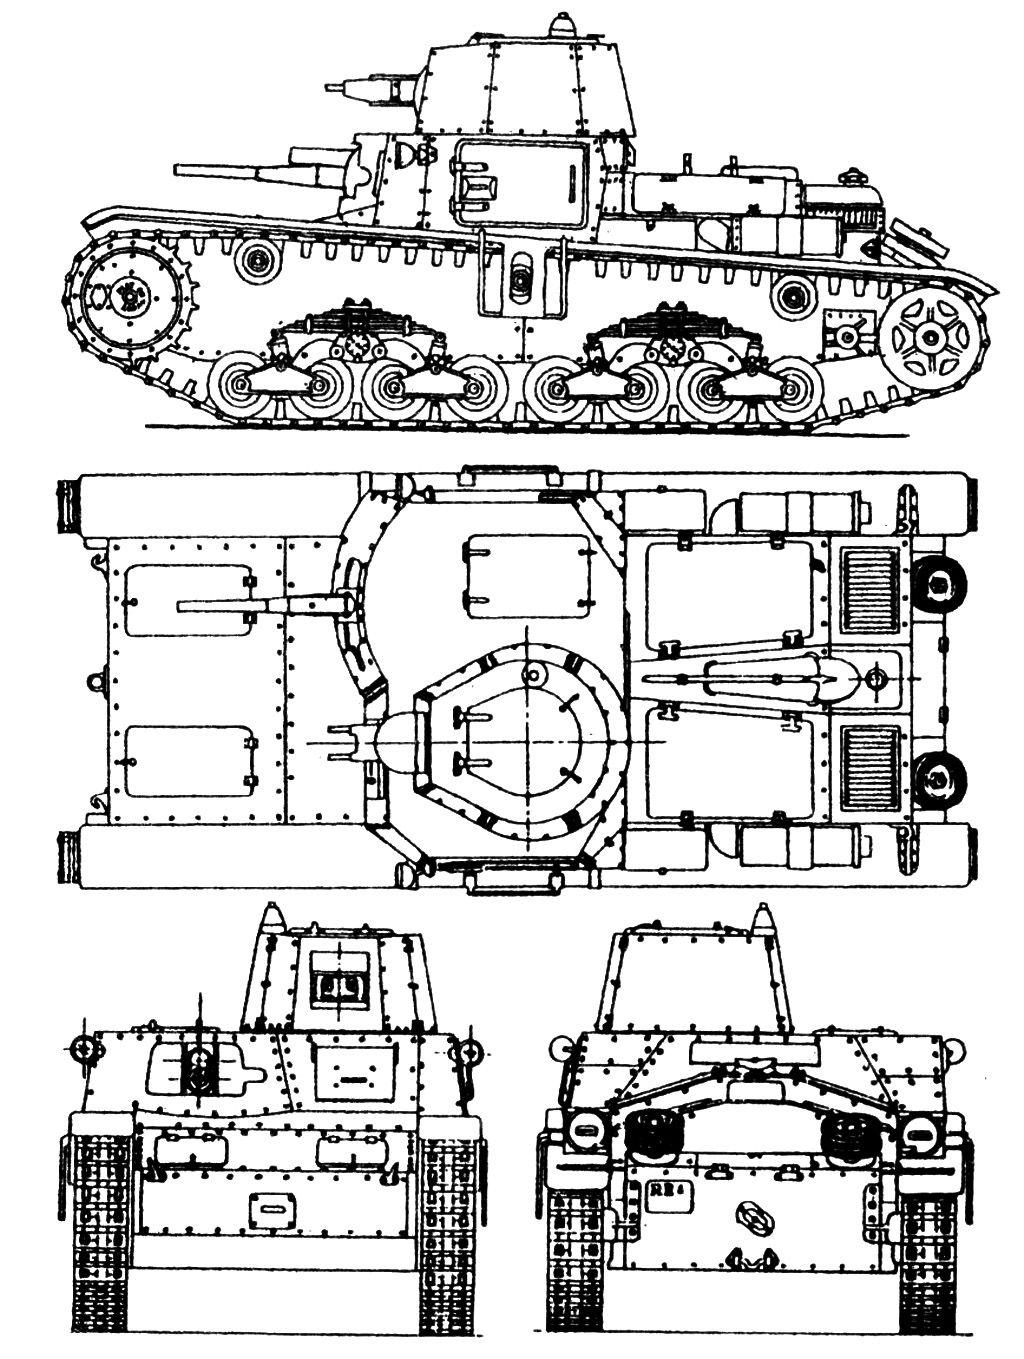 fiat ansaldo carro armato m11 39 37mm casemate cannon n kresy World of Tanks Maps fiat ansaldo carro armato m11 39 37mm casemate cannon world of tanks